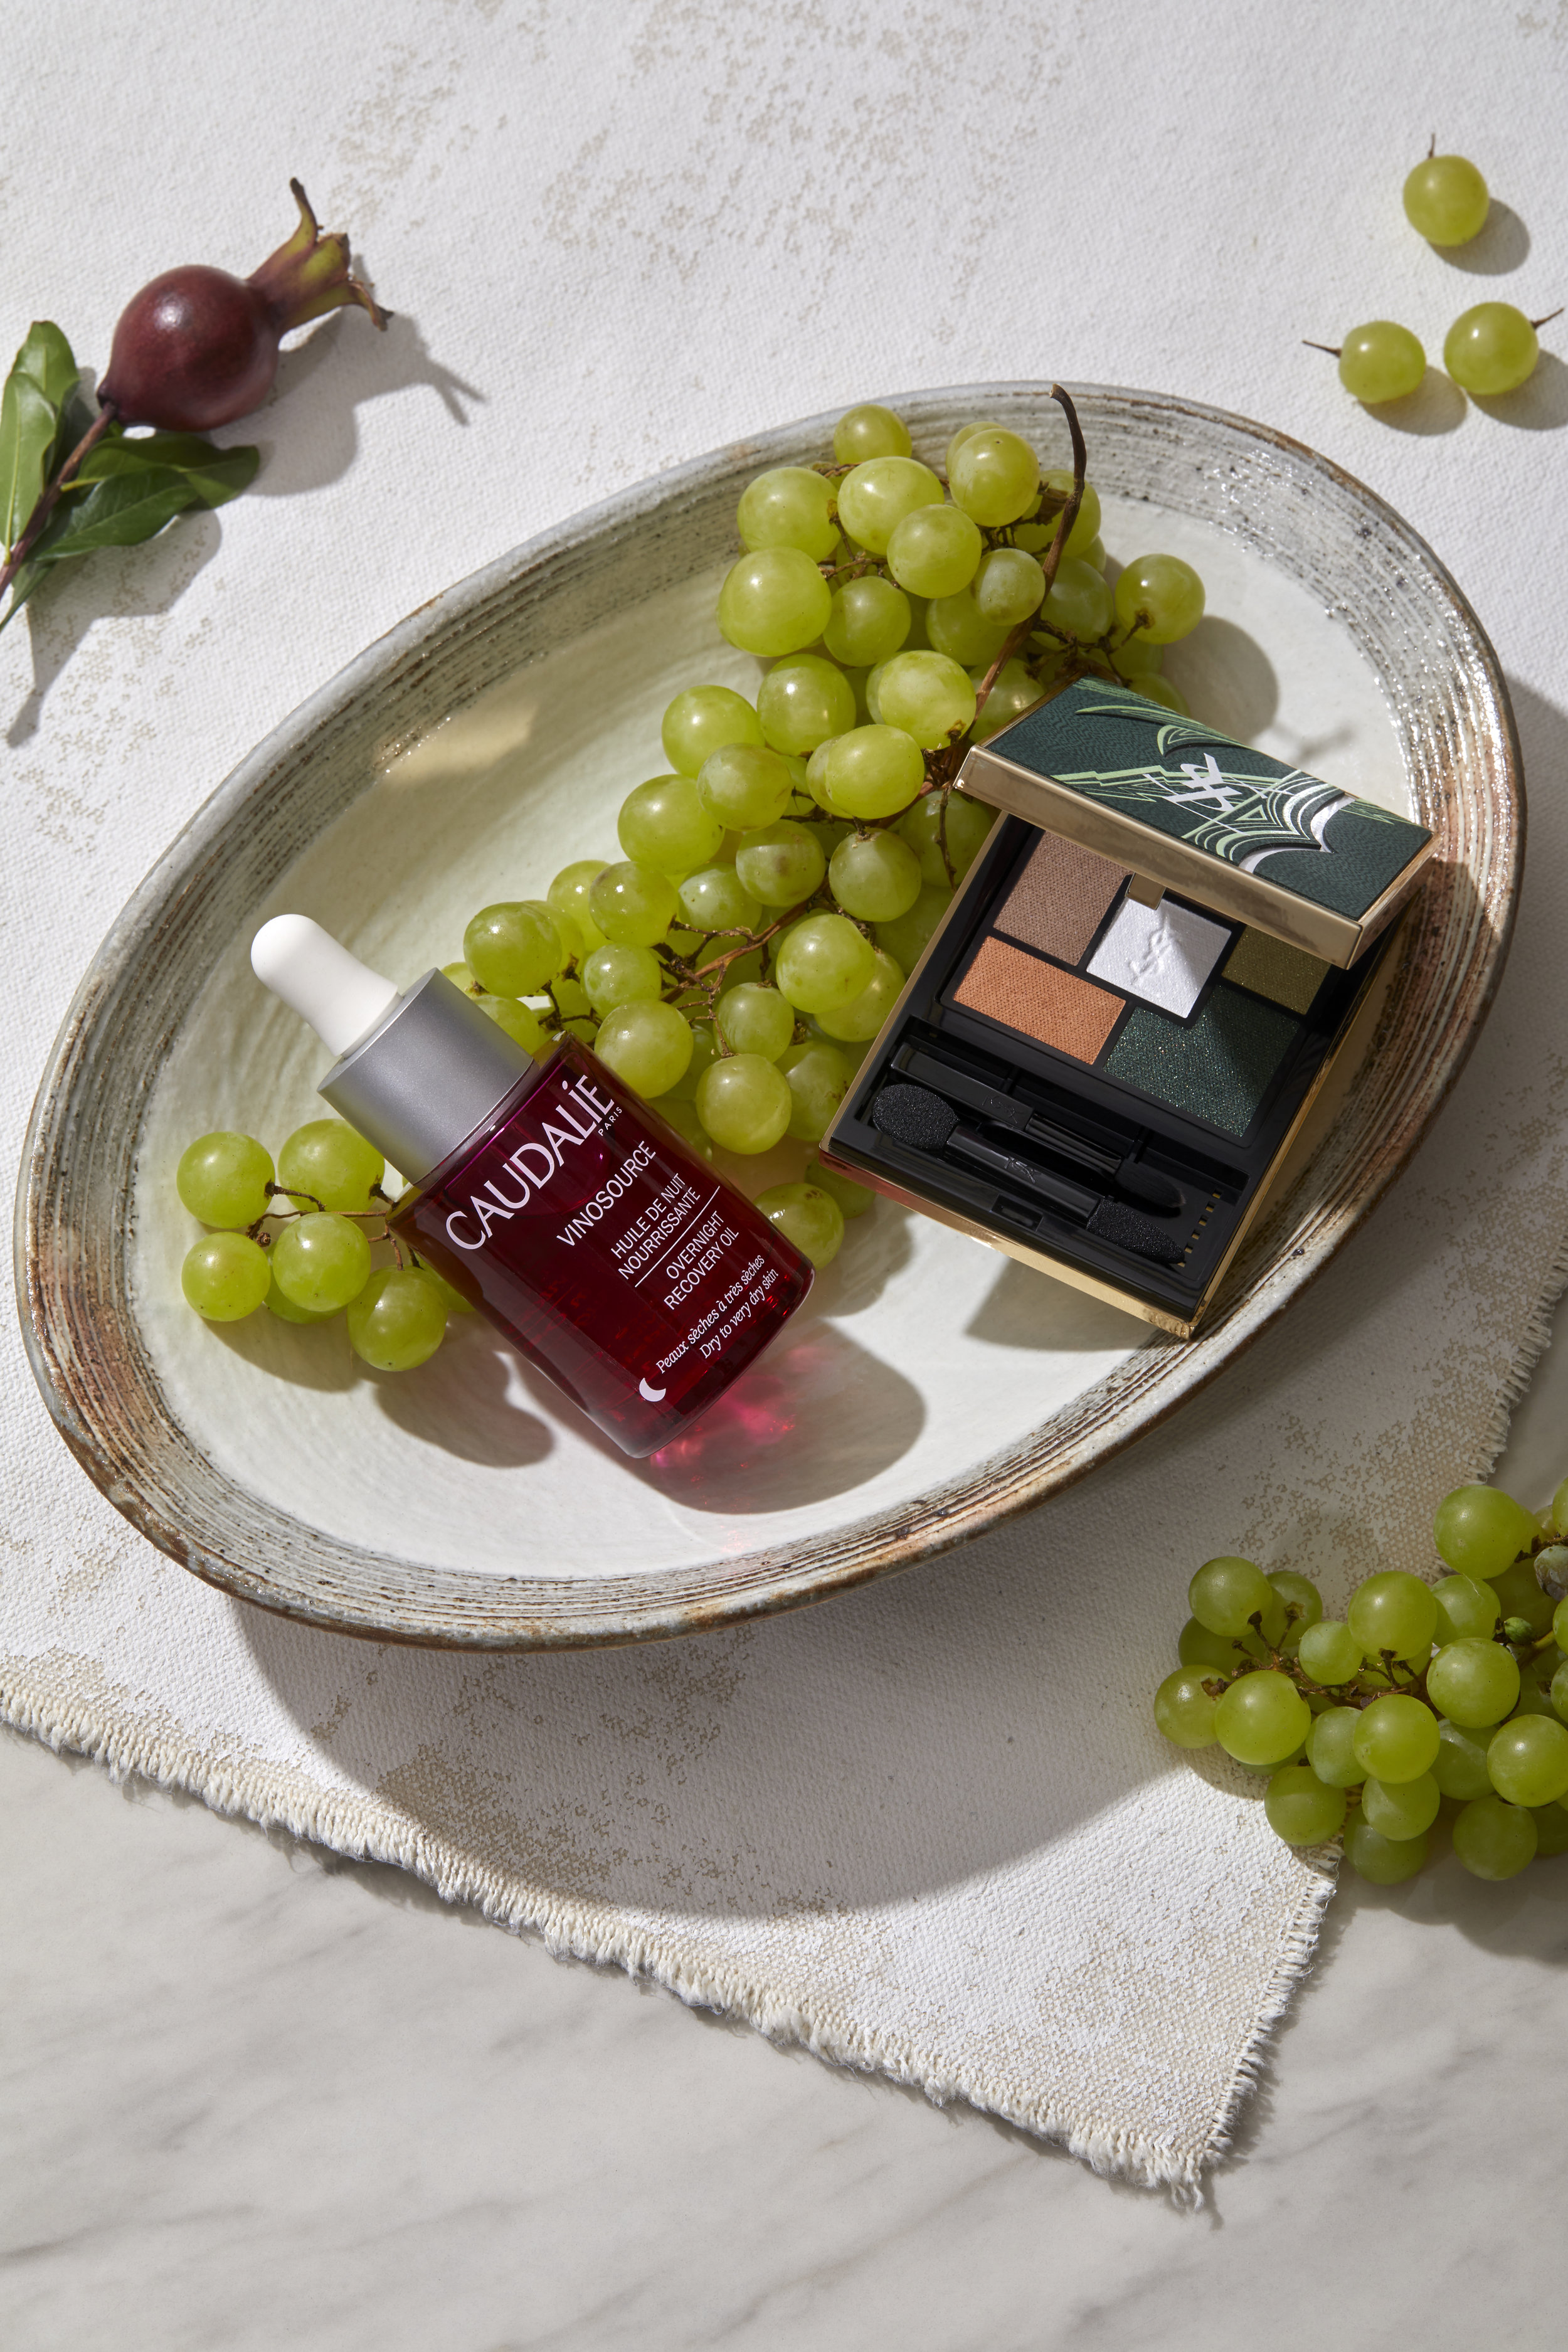 jeanette_perfume3677.jpg